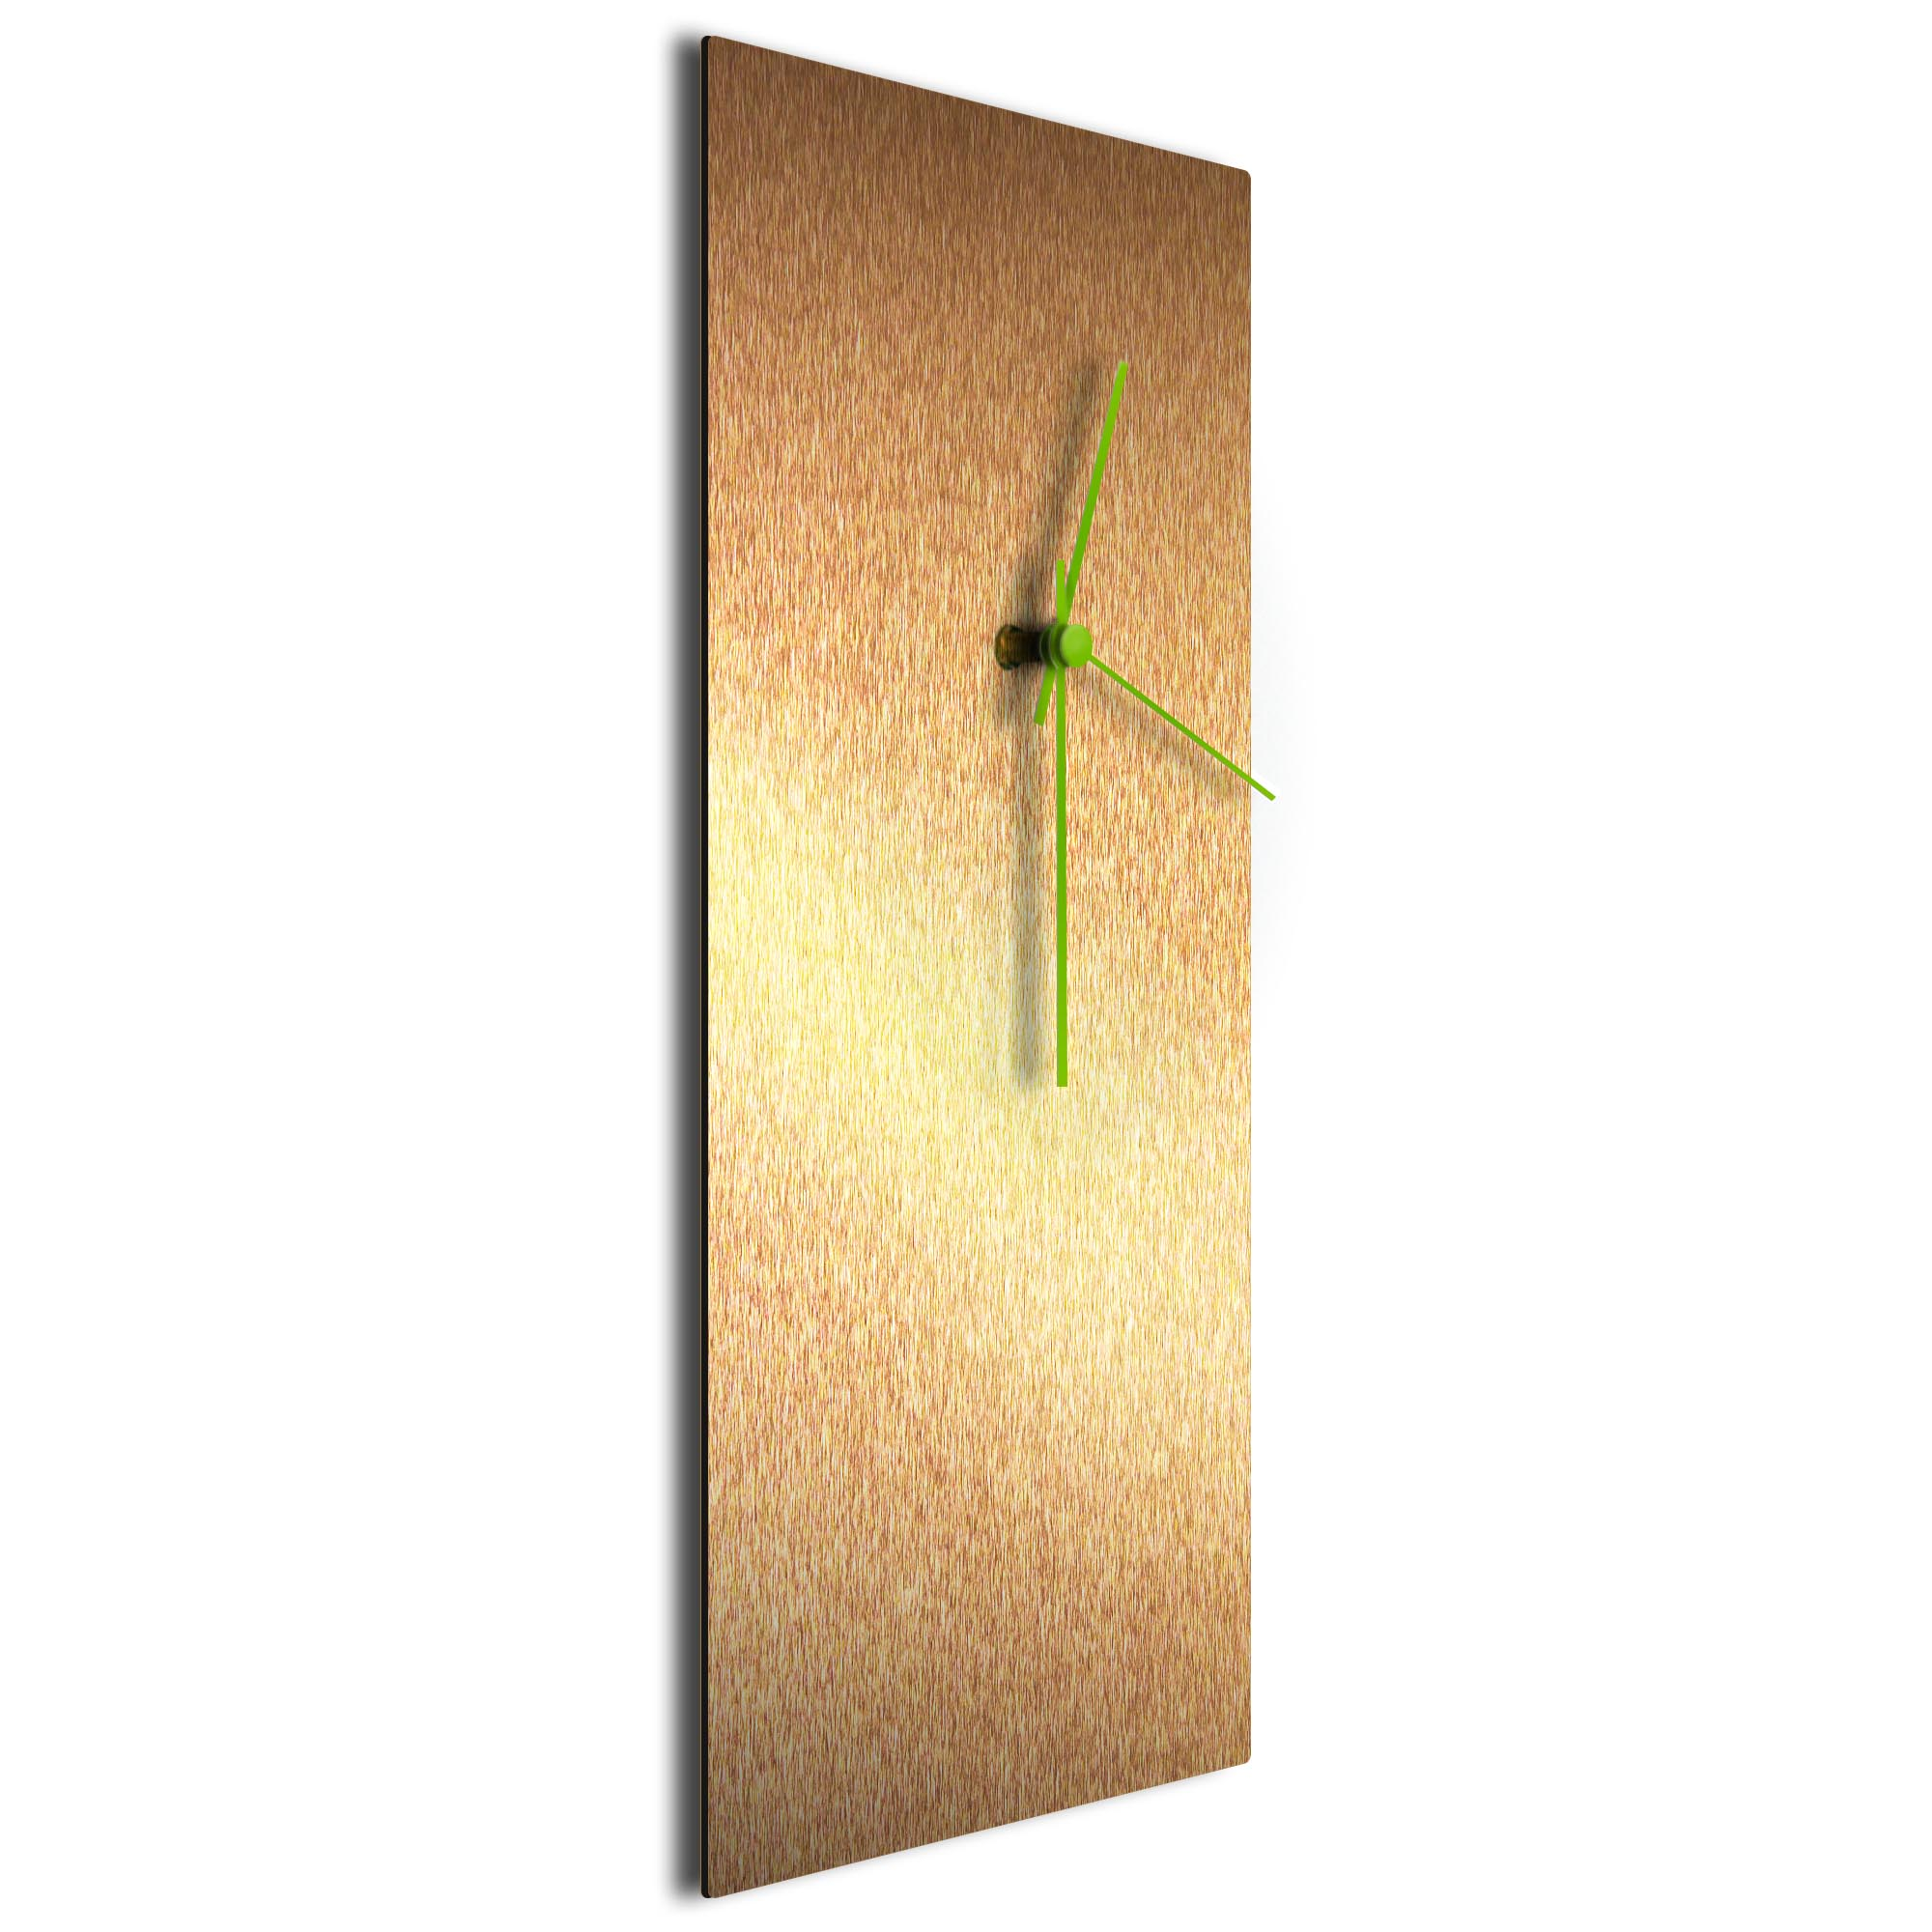 Bronzesmith Clock Large Green - Image 2